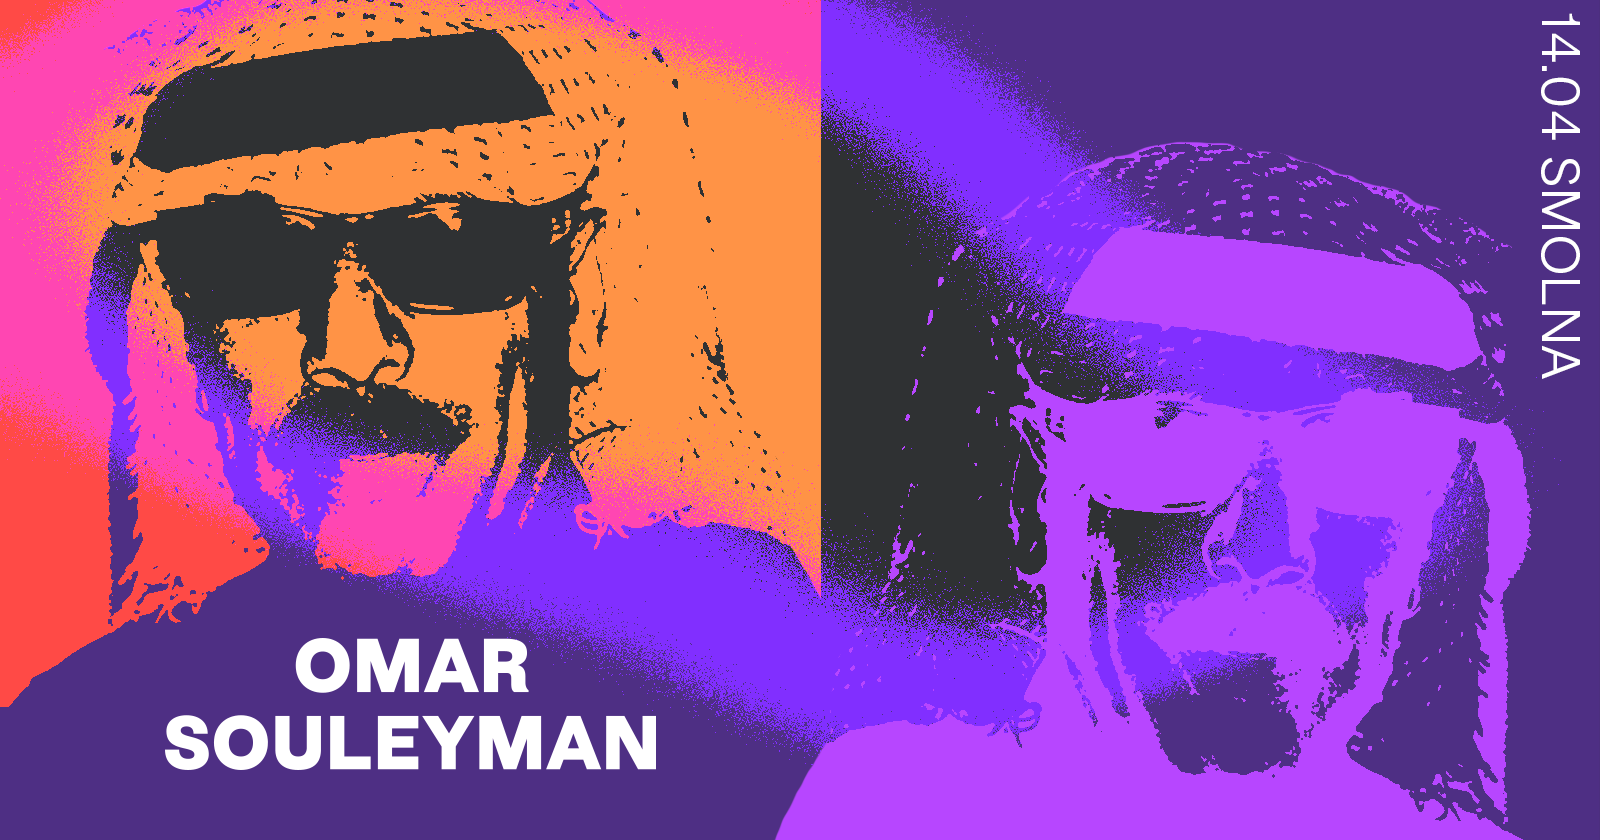 Plakat promujący koncert omar souleyman